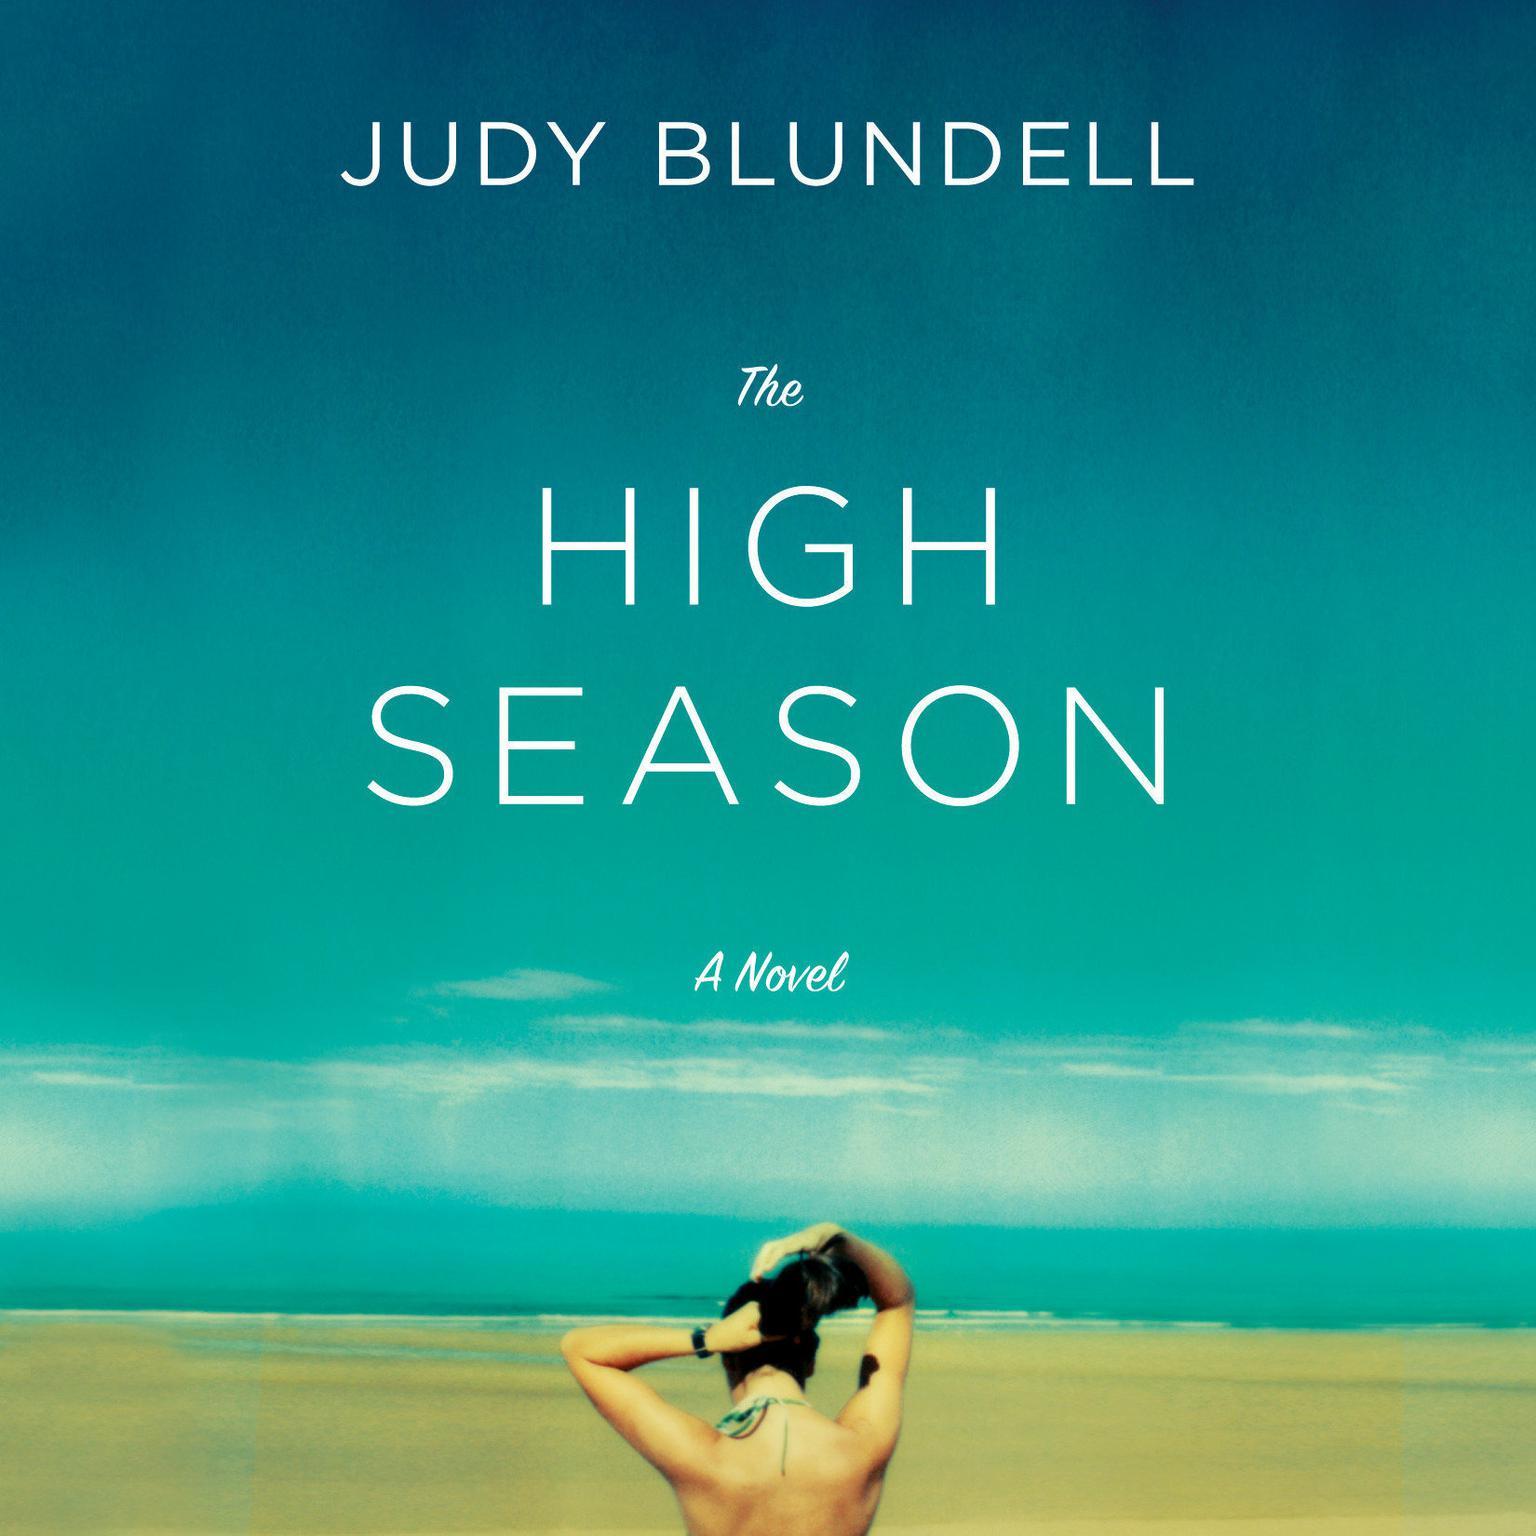 The High Season: A Novel Audiobook, by Judy Blundell